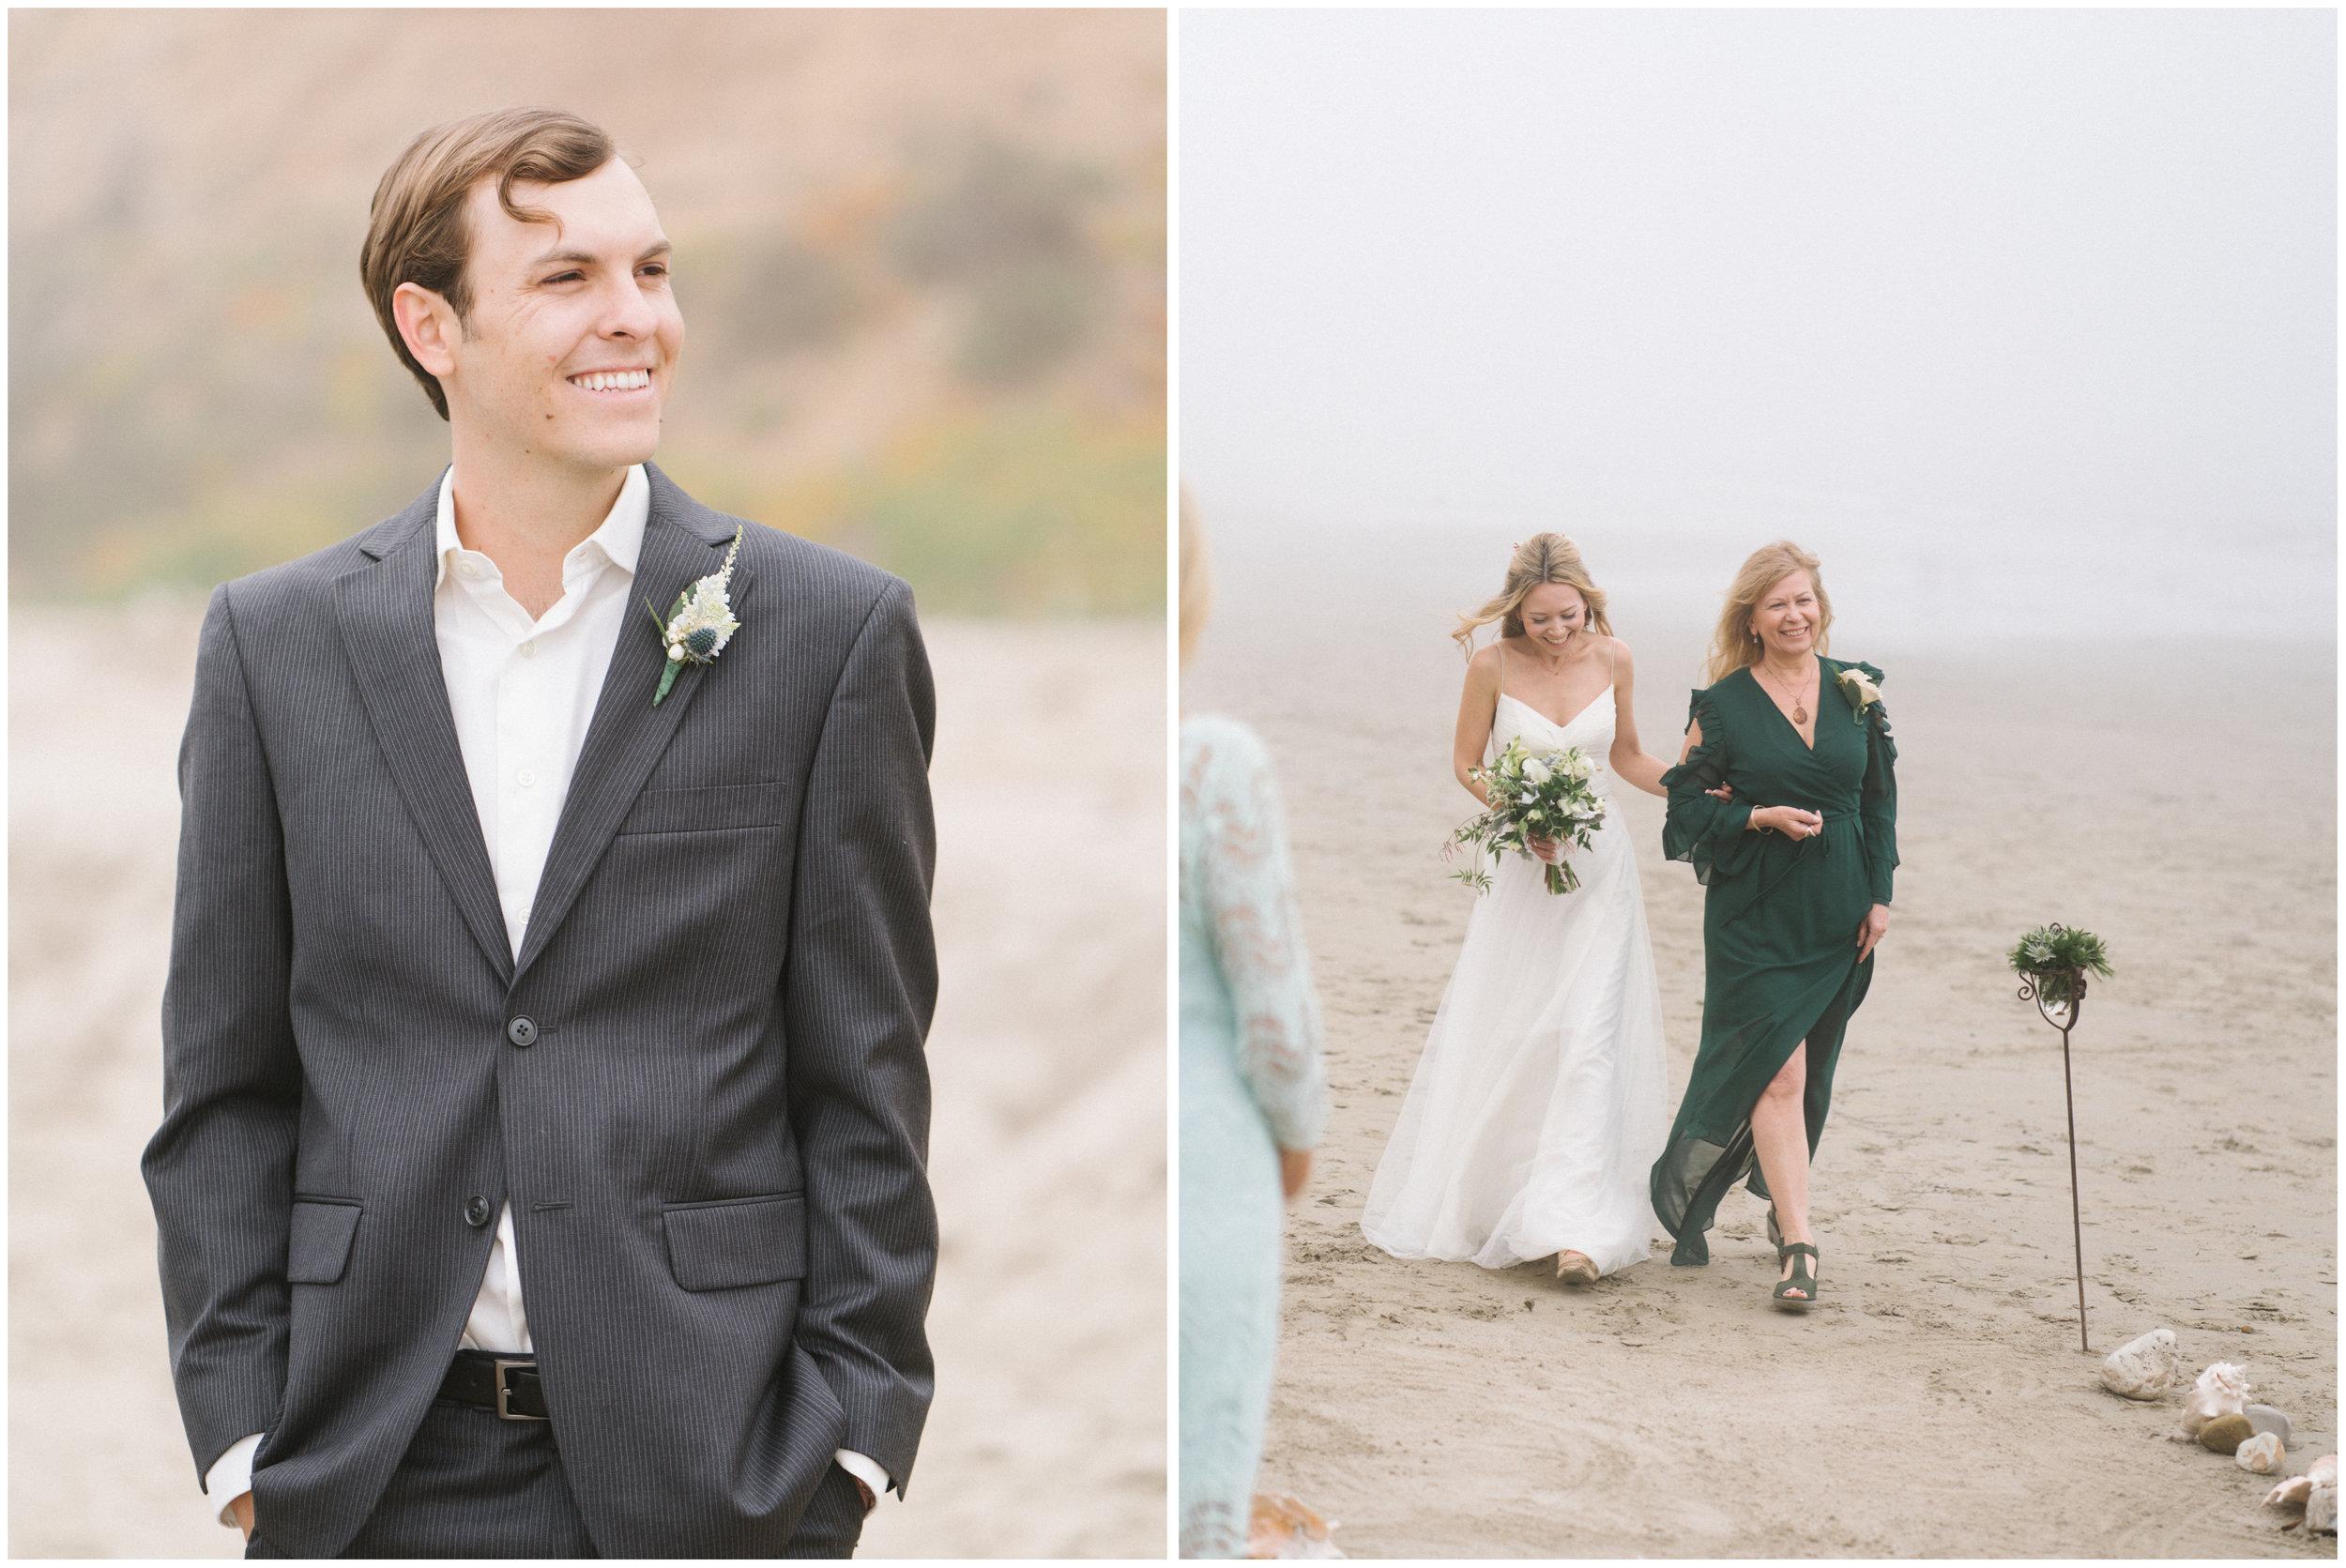 Santa Barbara Elopement Wedding Photographer - Pinnel Photography-02.jpg